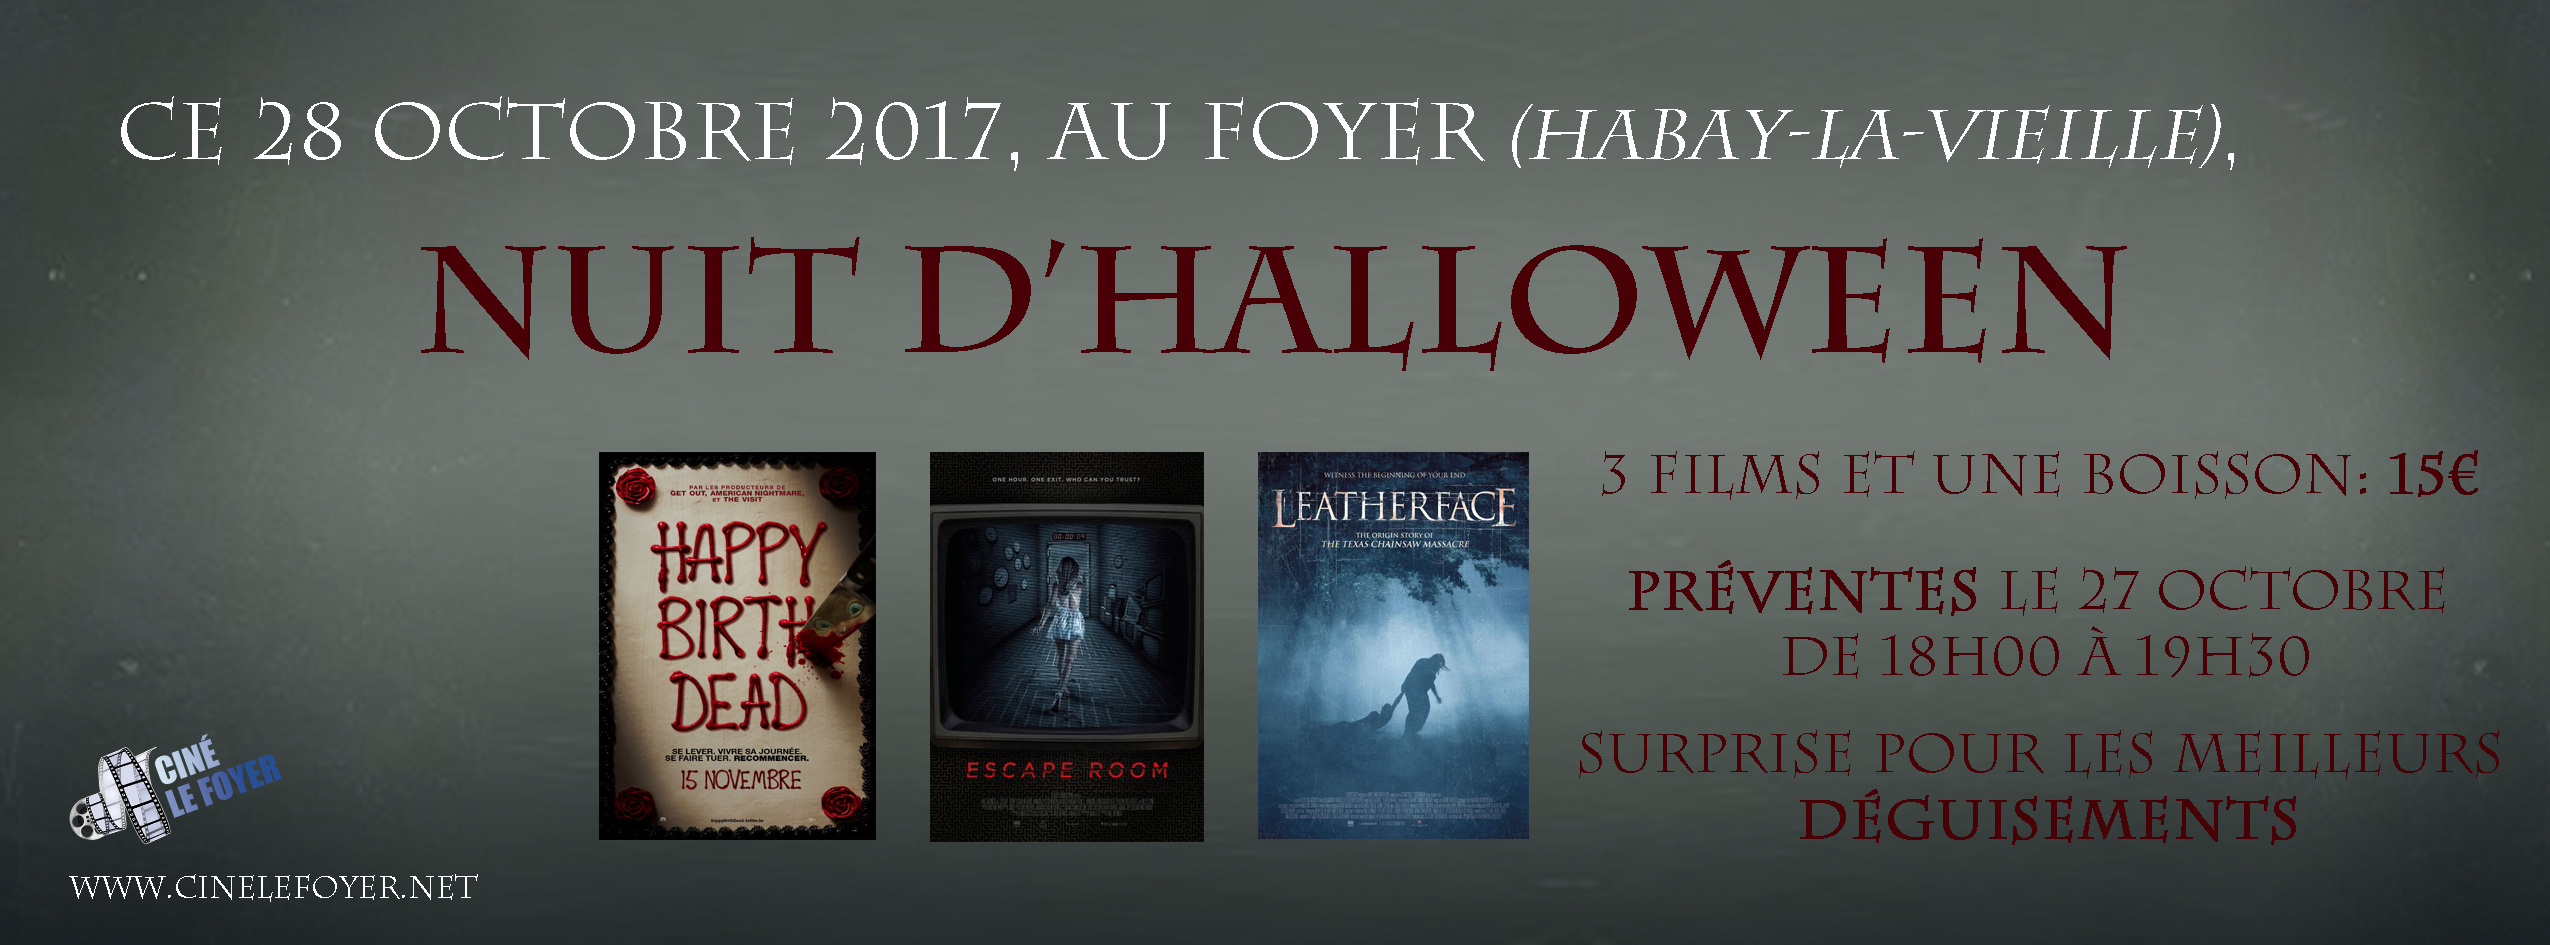 Nuit Halloween au cinéma 2017